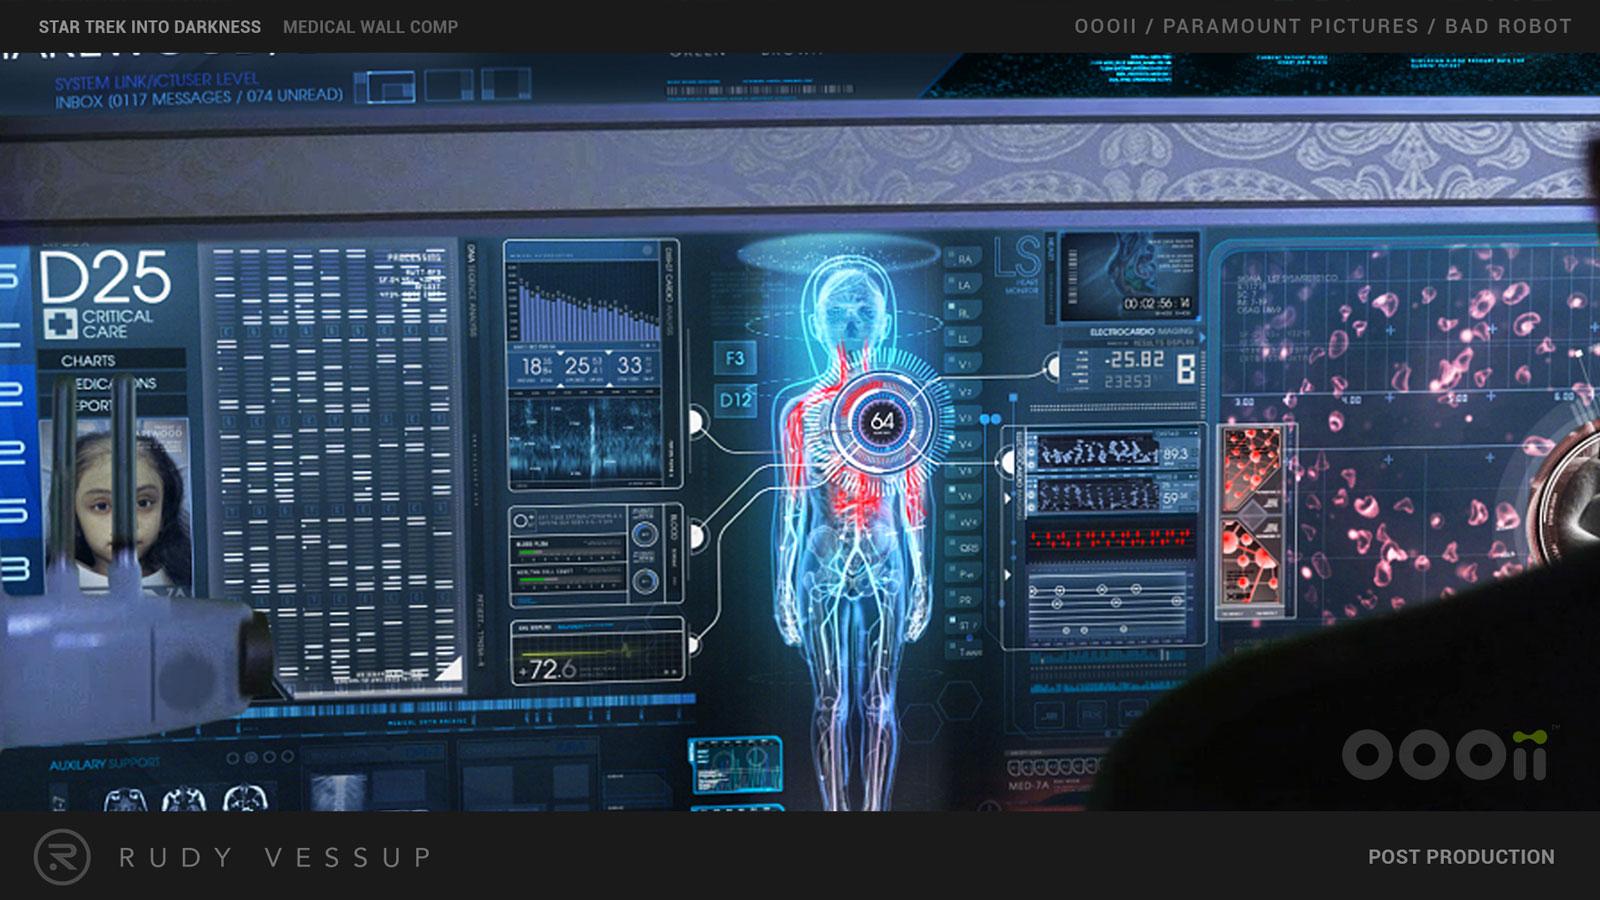 star_trek_medical_wall_interface_concept1.jpg